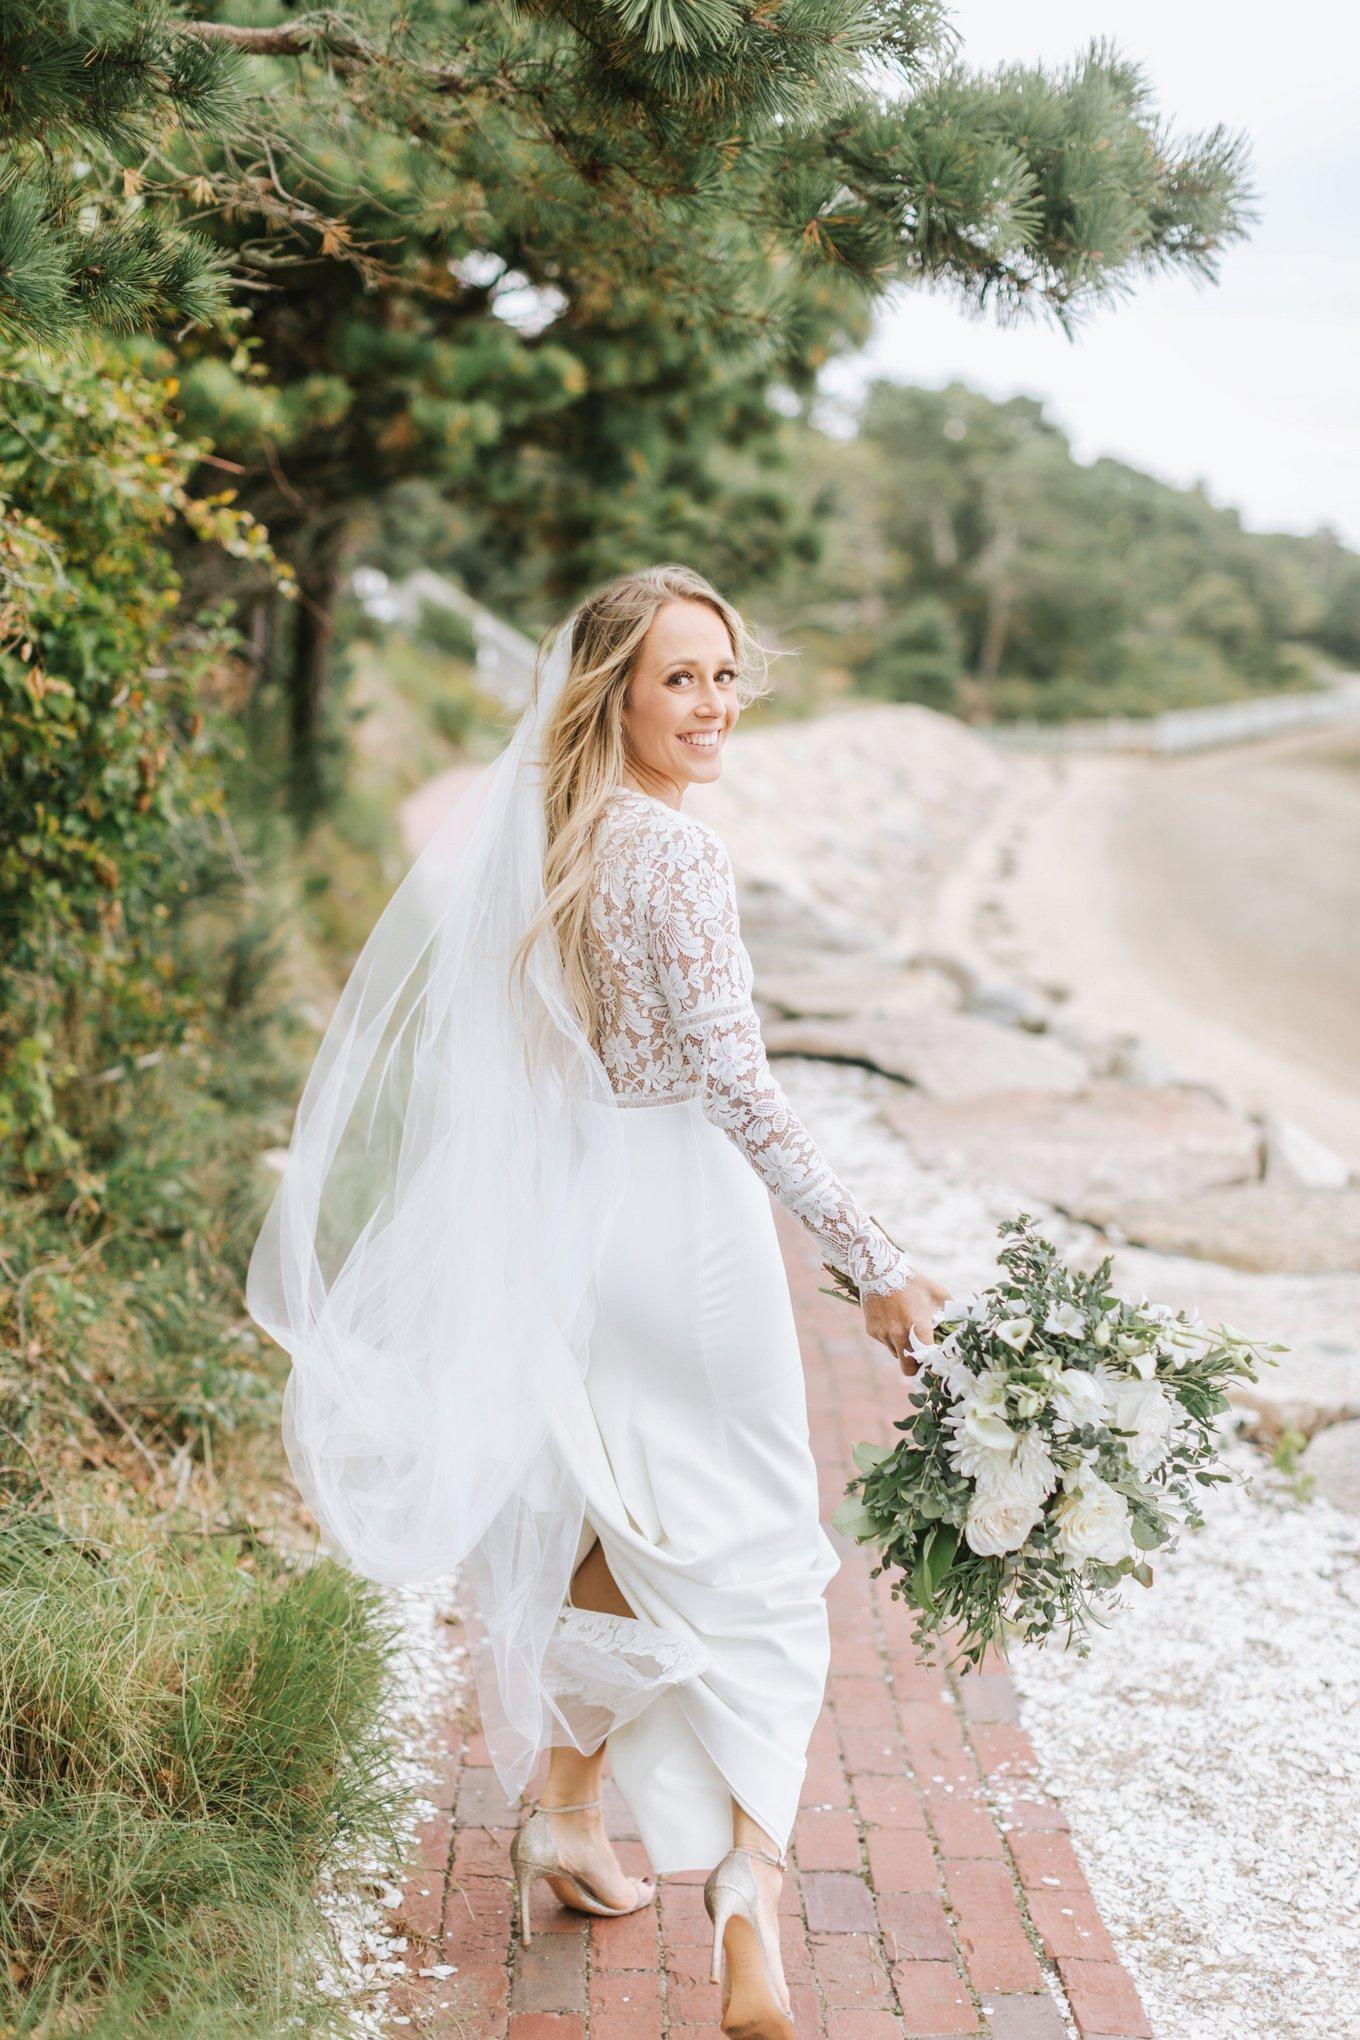 Wequassett-Wedding-Photographer-Cape-Cod-Boston-Lena-Mirisola-17.jpg